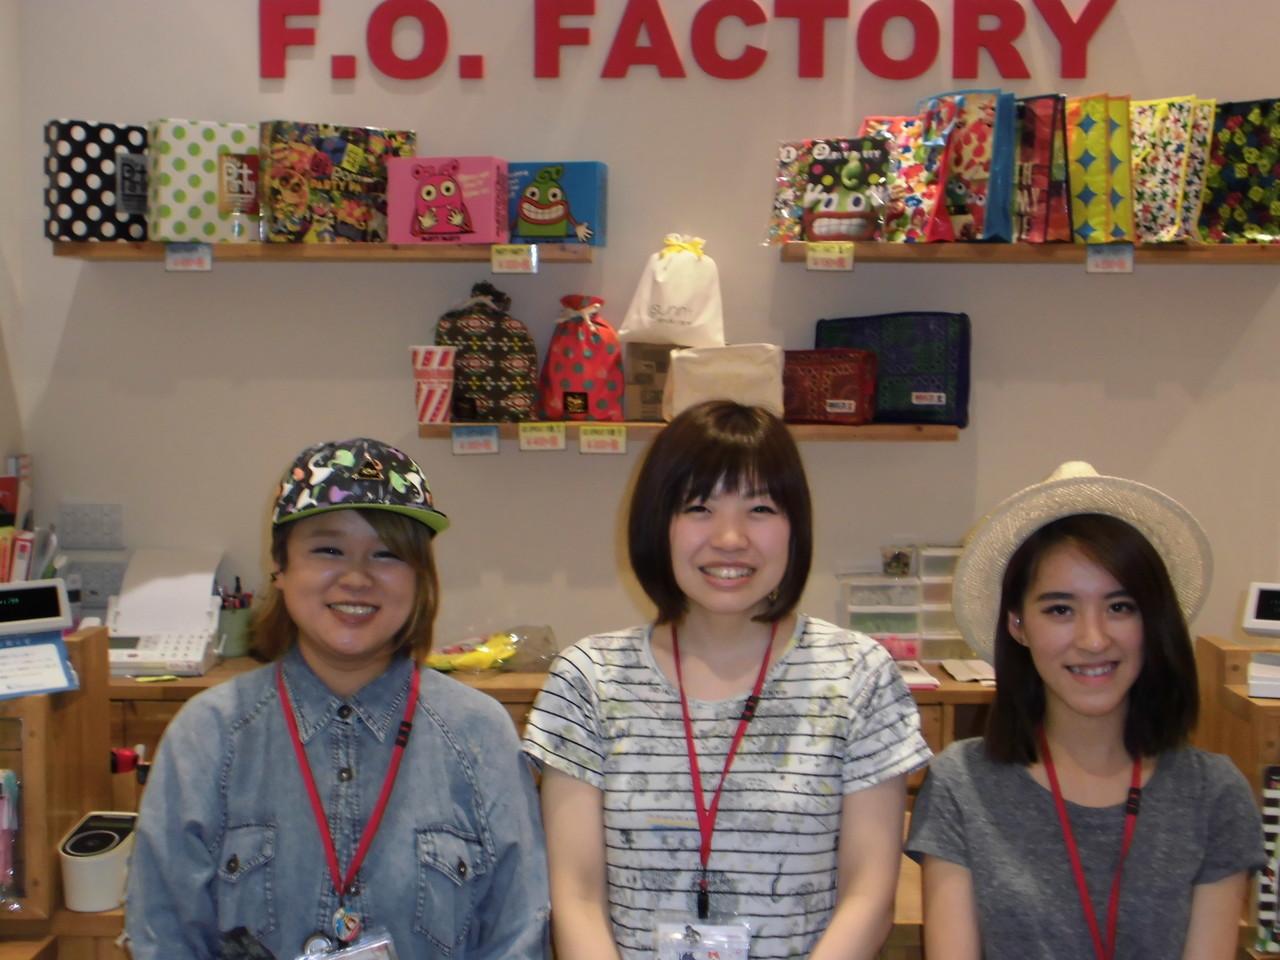 F.O.FACTORY 新発田店